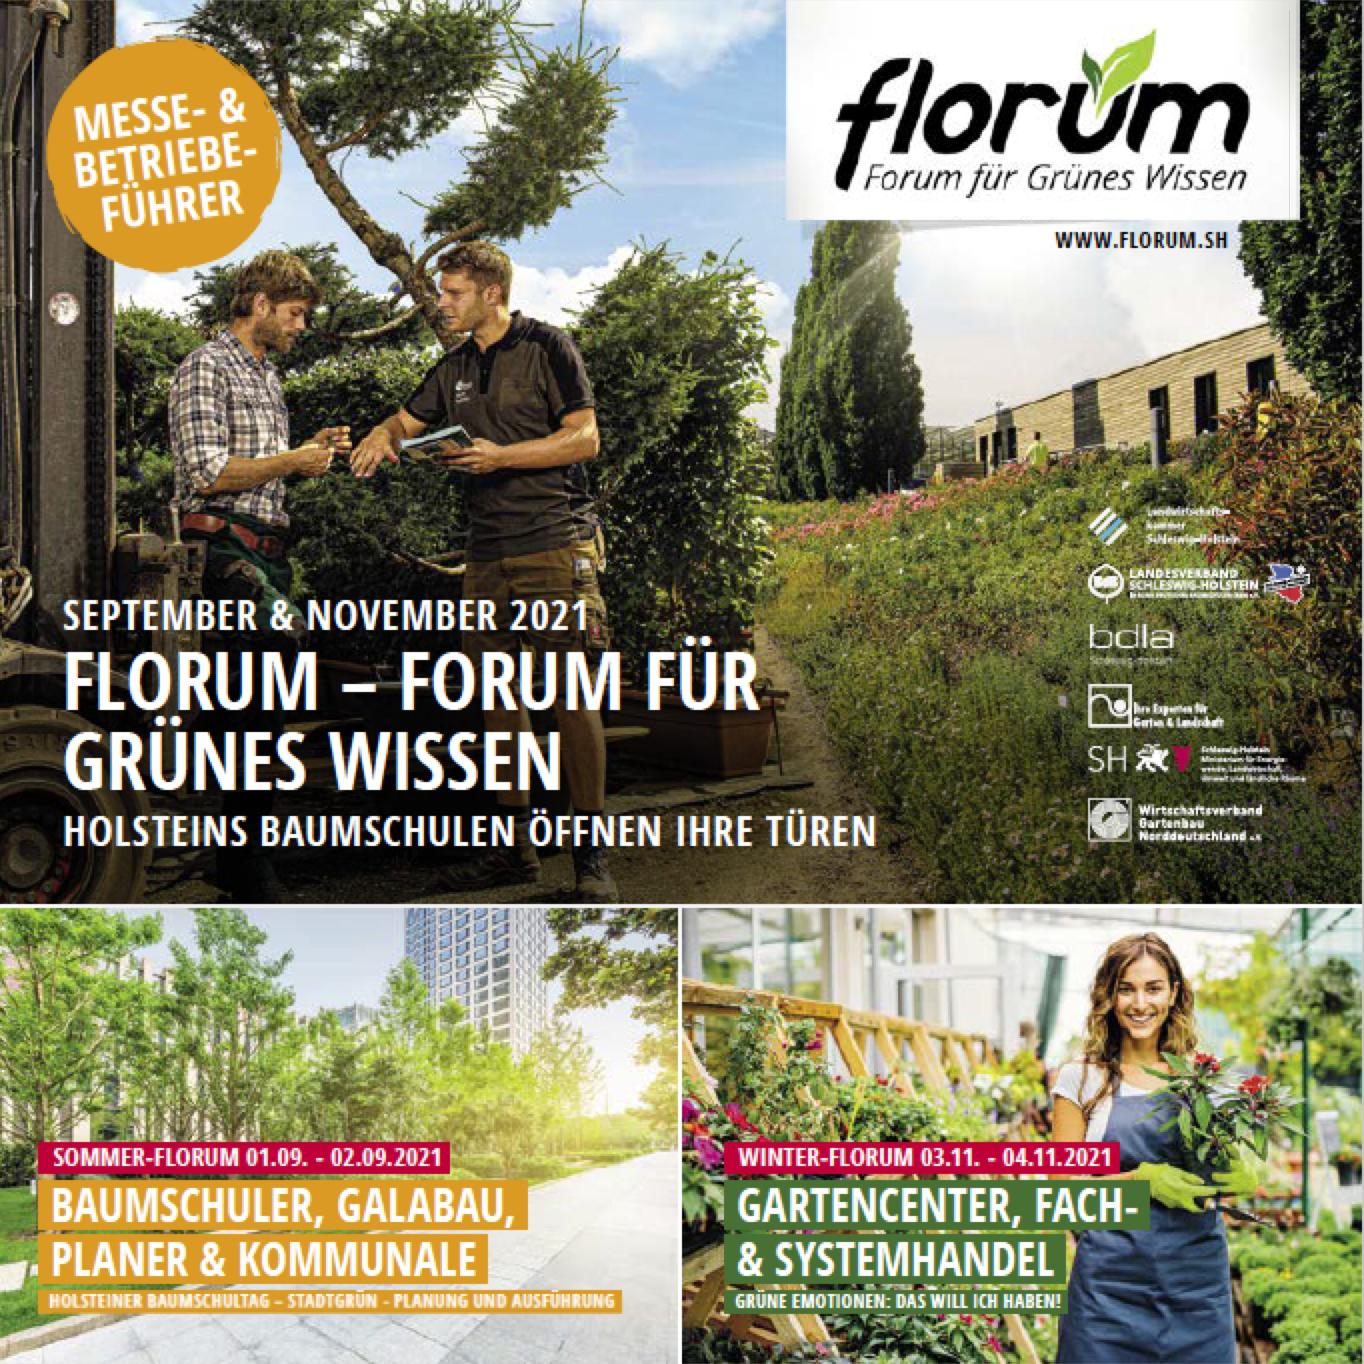 Betriebeführer Florum 2021